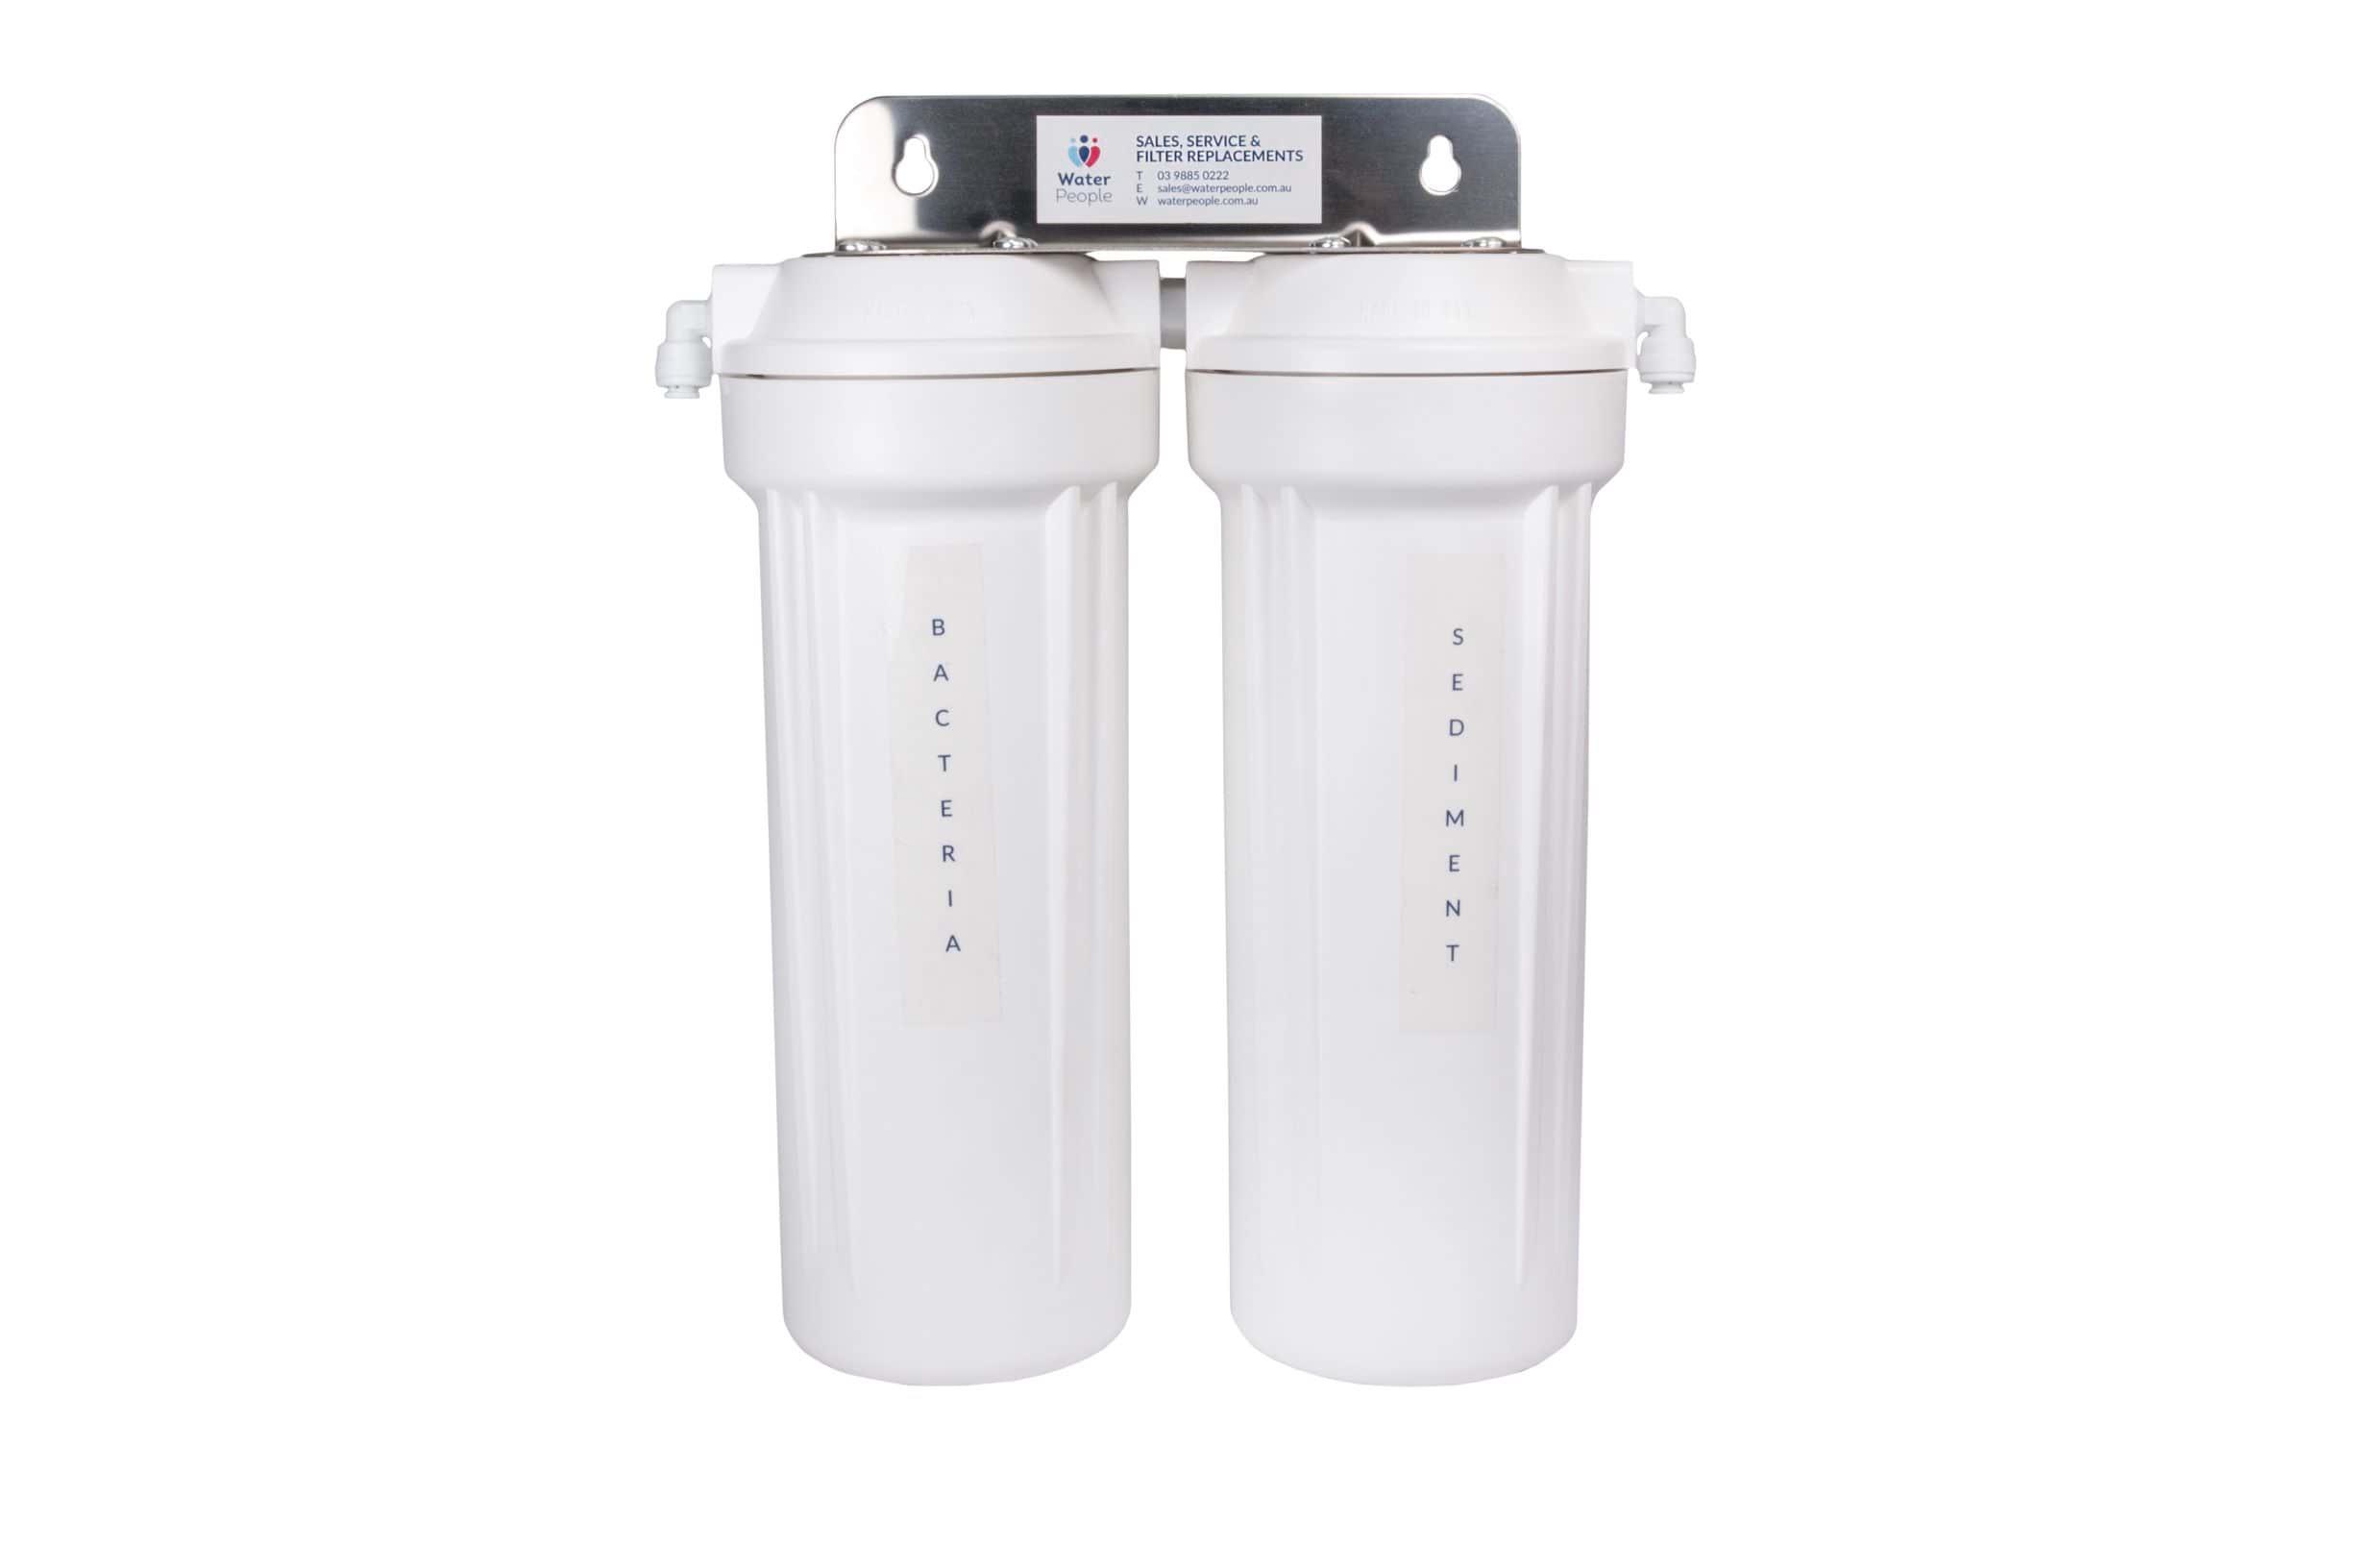 Aquakleen Twin Bacteria Filter System